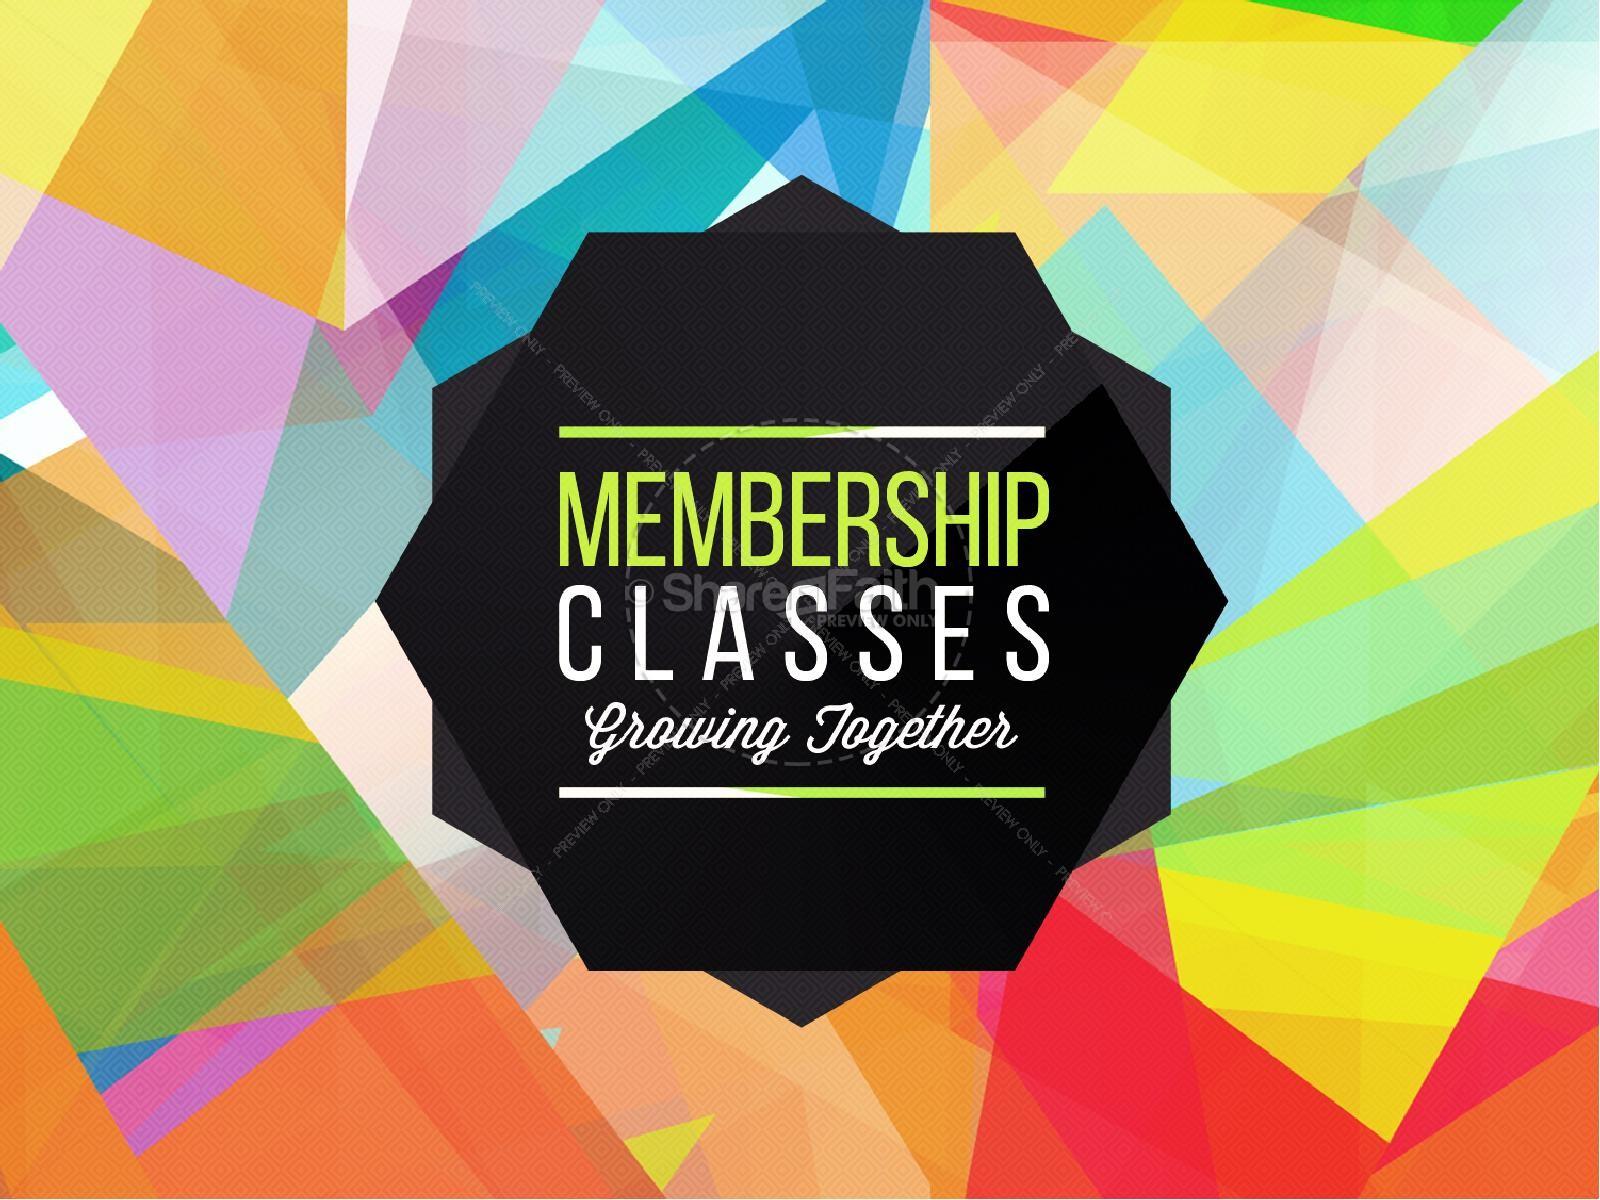 Membership Classes Church PowerPoint | slide 1